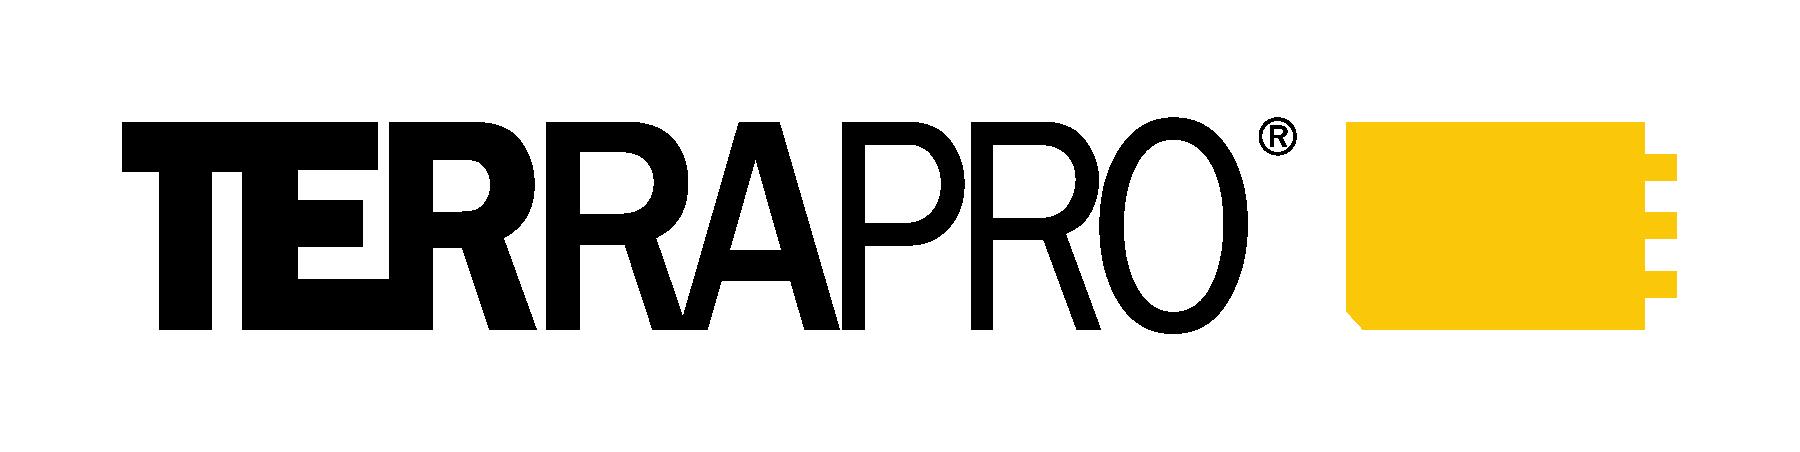 terrapro_logo_2019